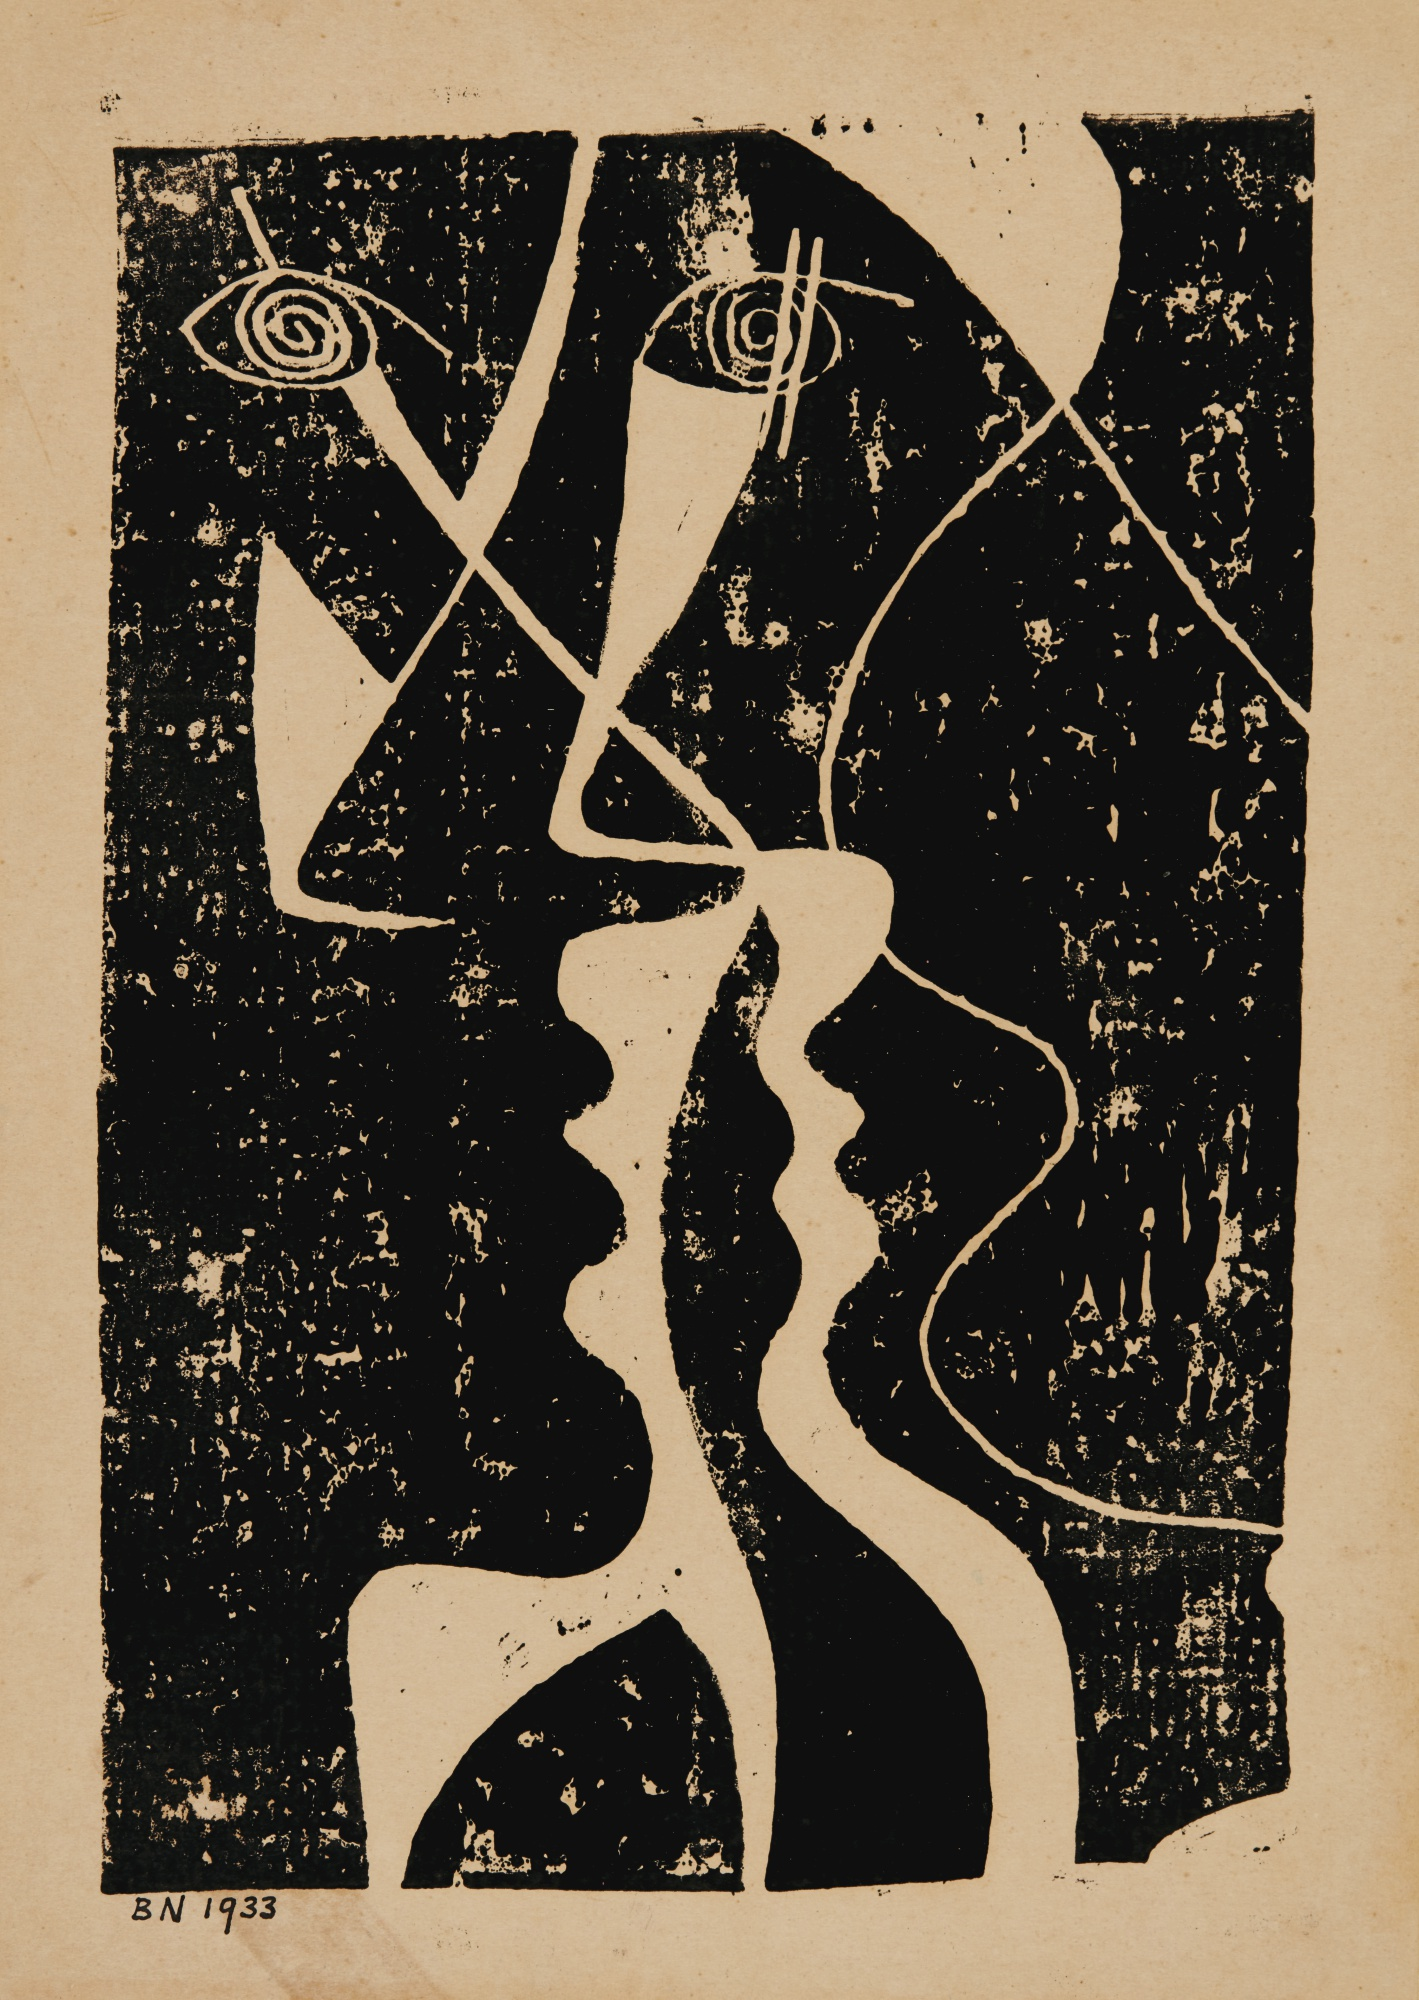 Ben Nicholson-Profiles-1933